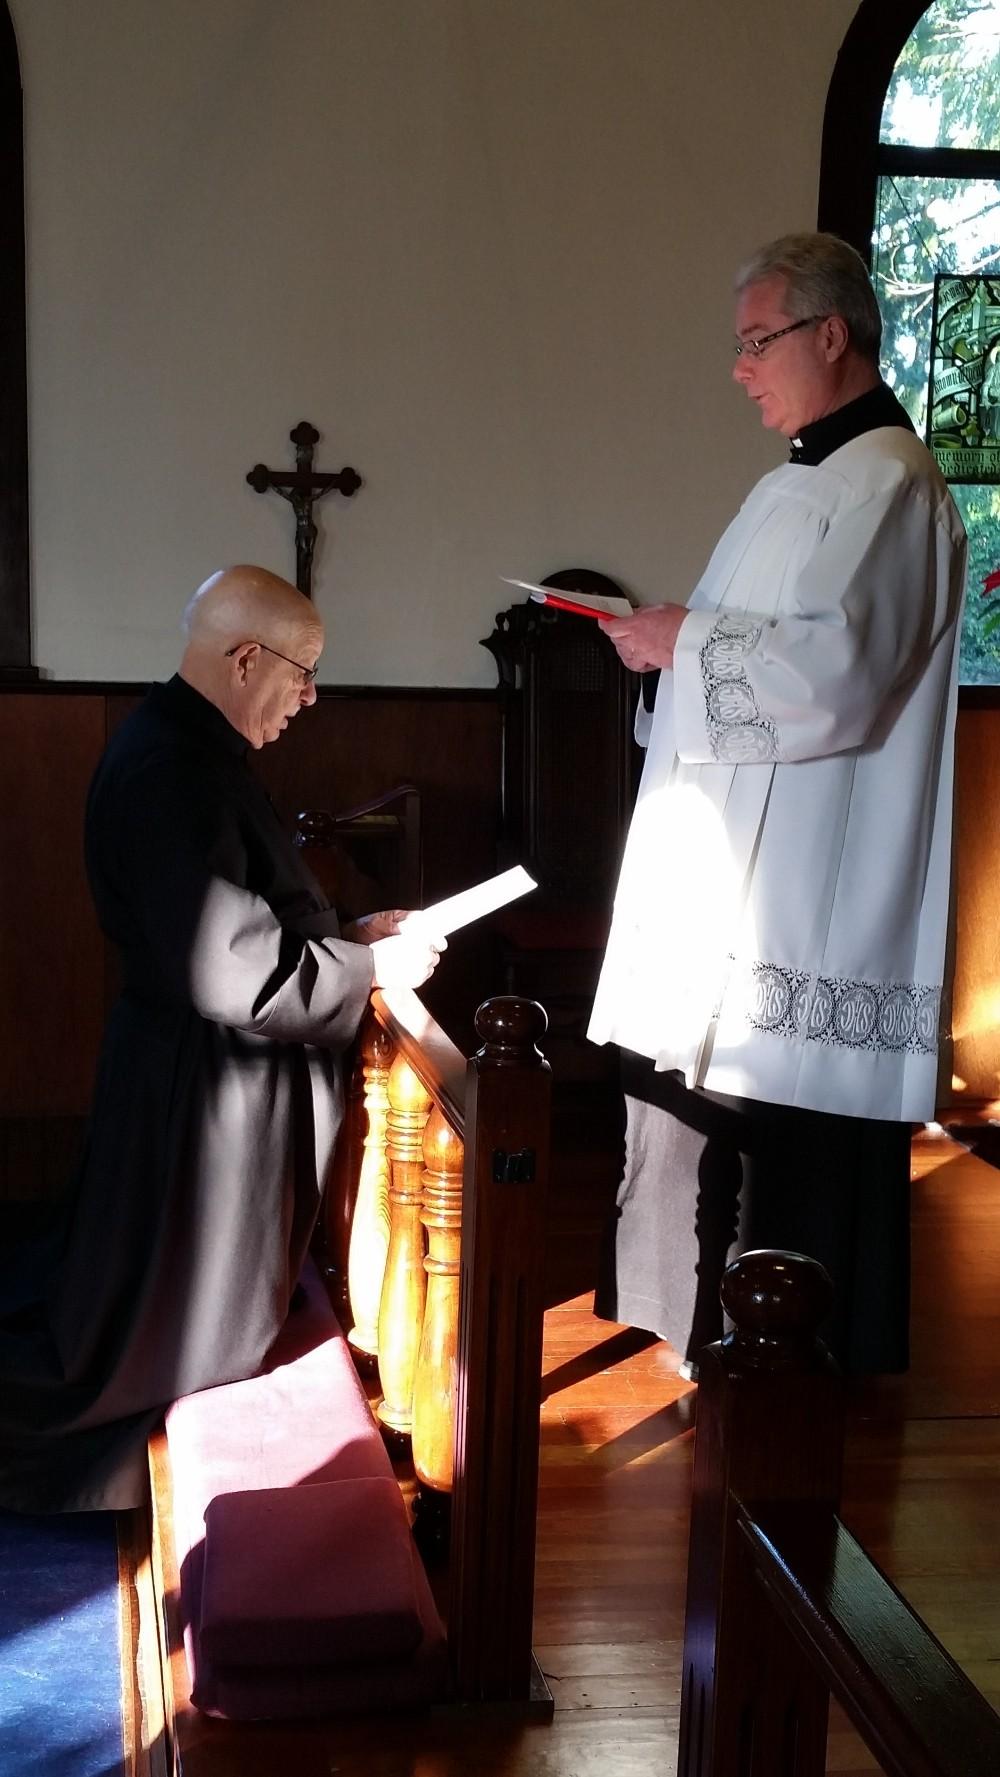 Malins, Fr. Don 160109.03